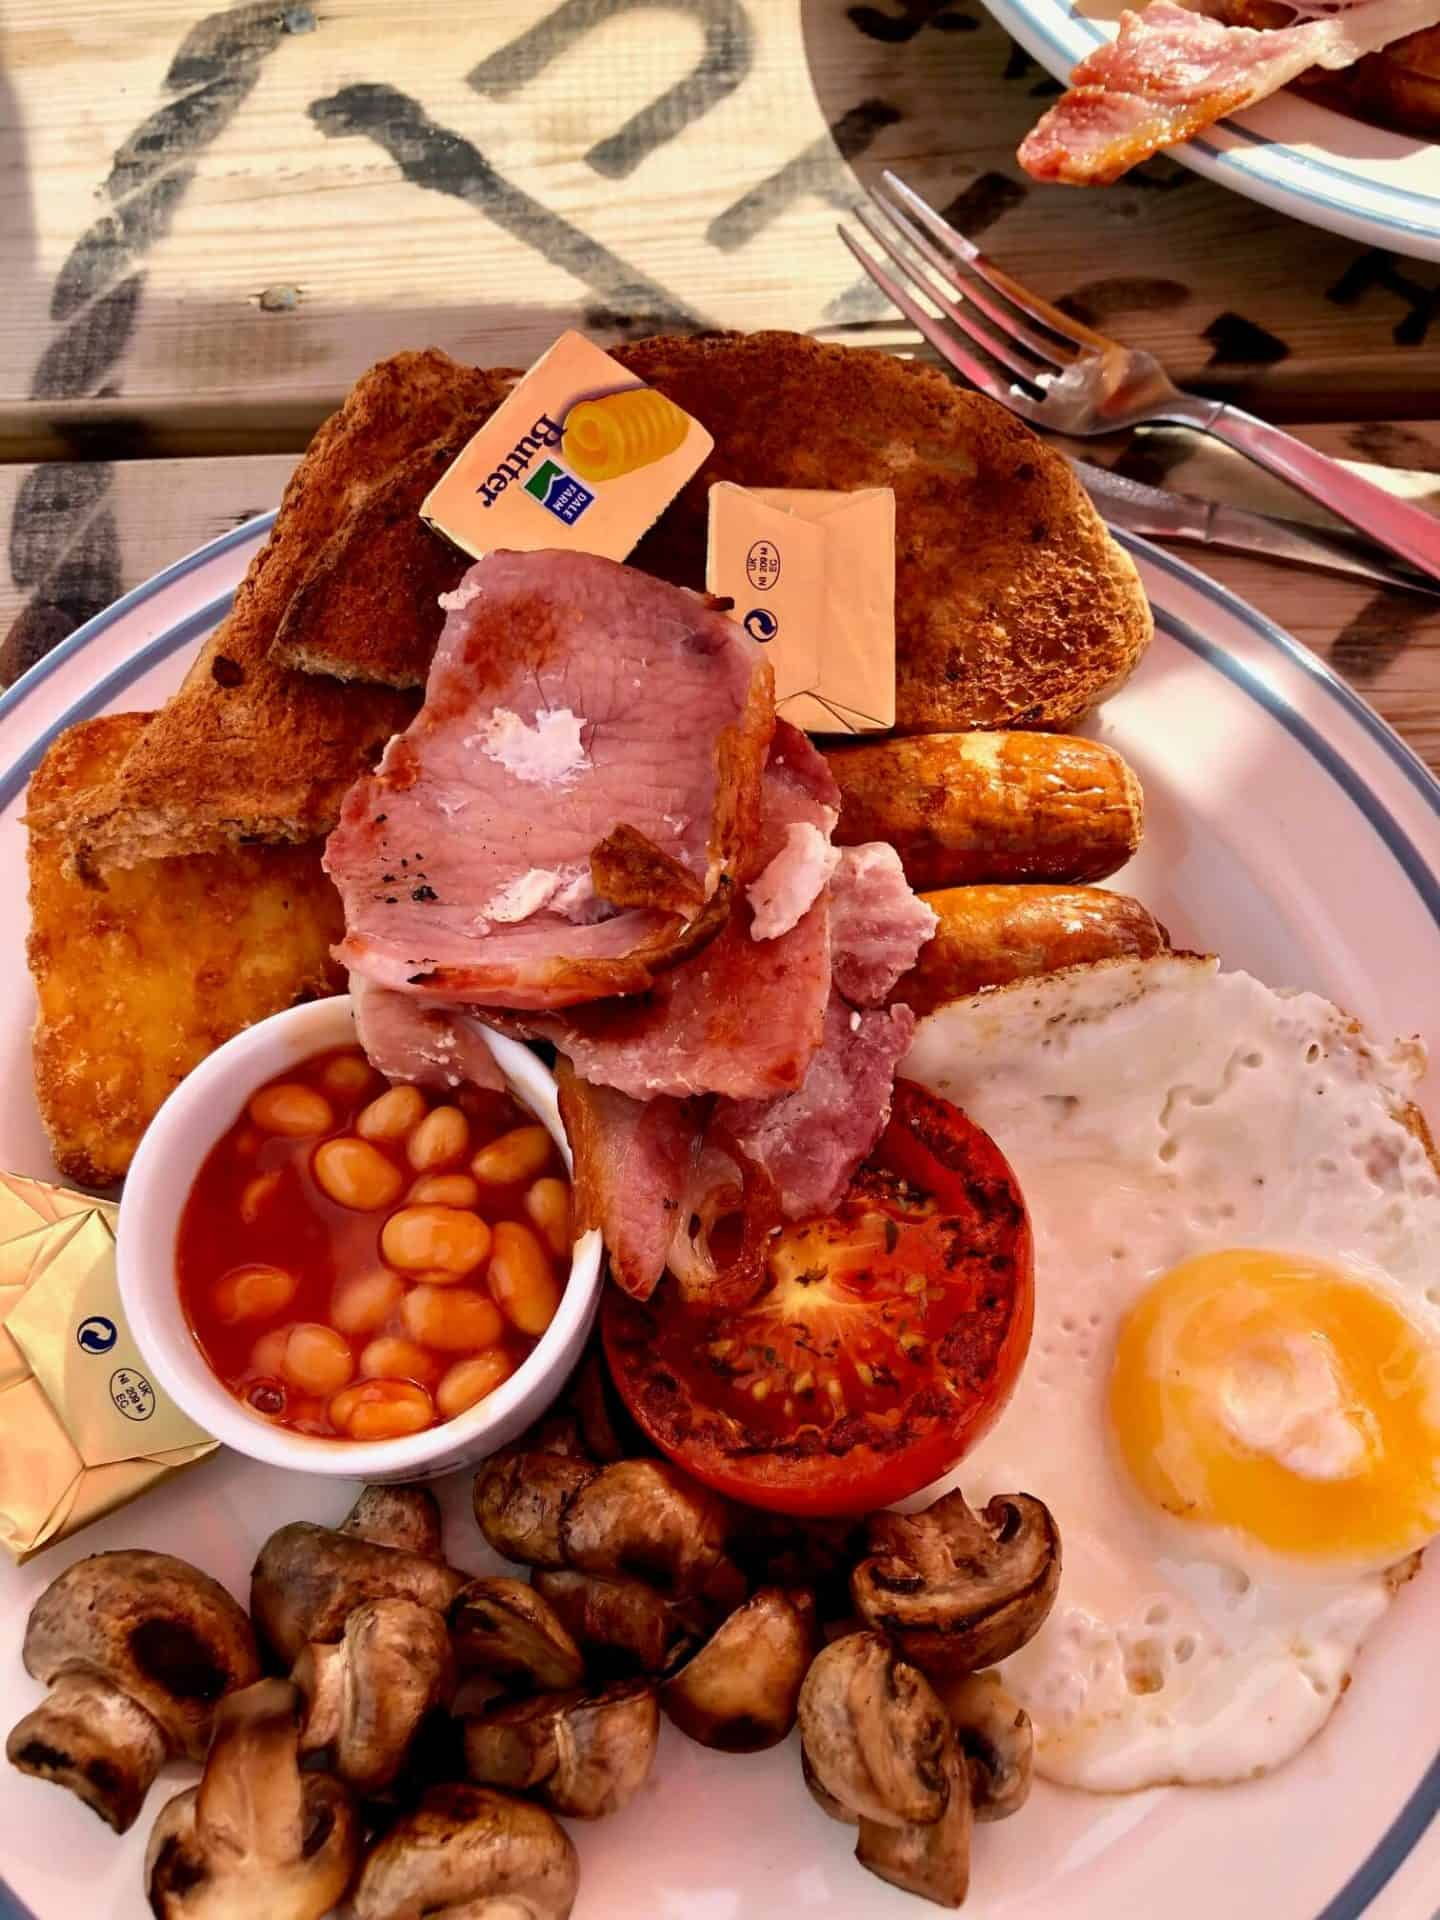 Full English breakfast at Poldhu Beach Cafe